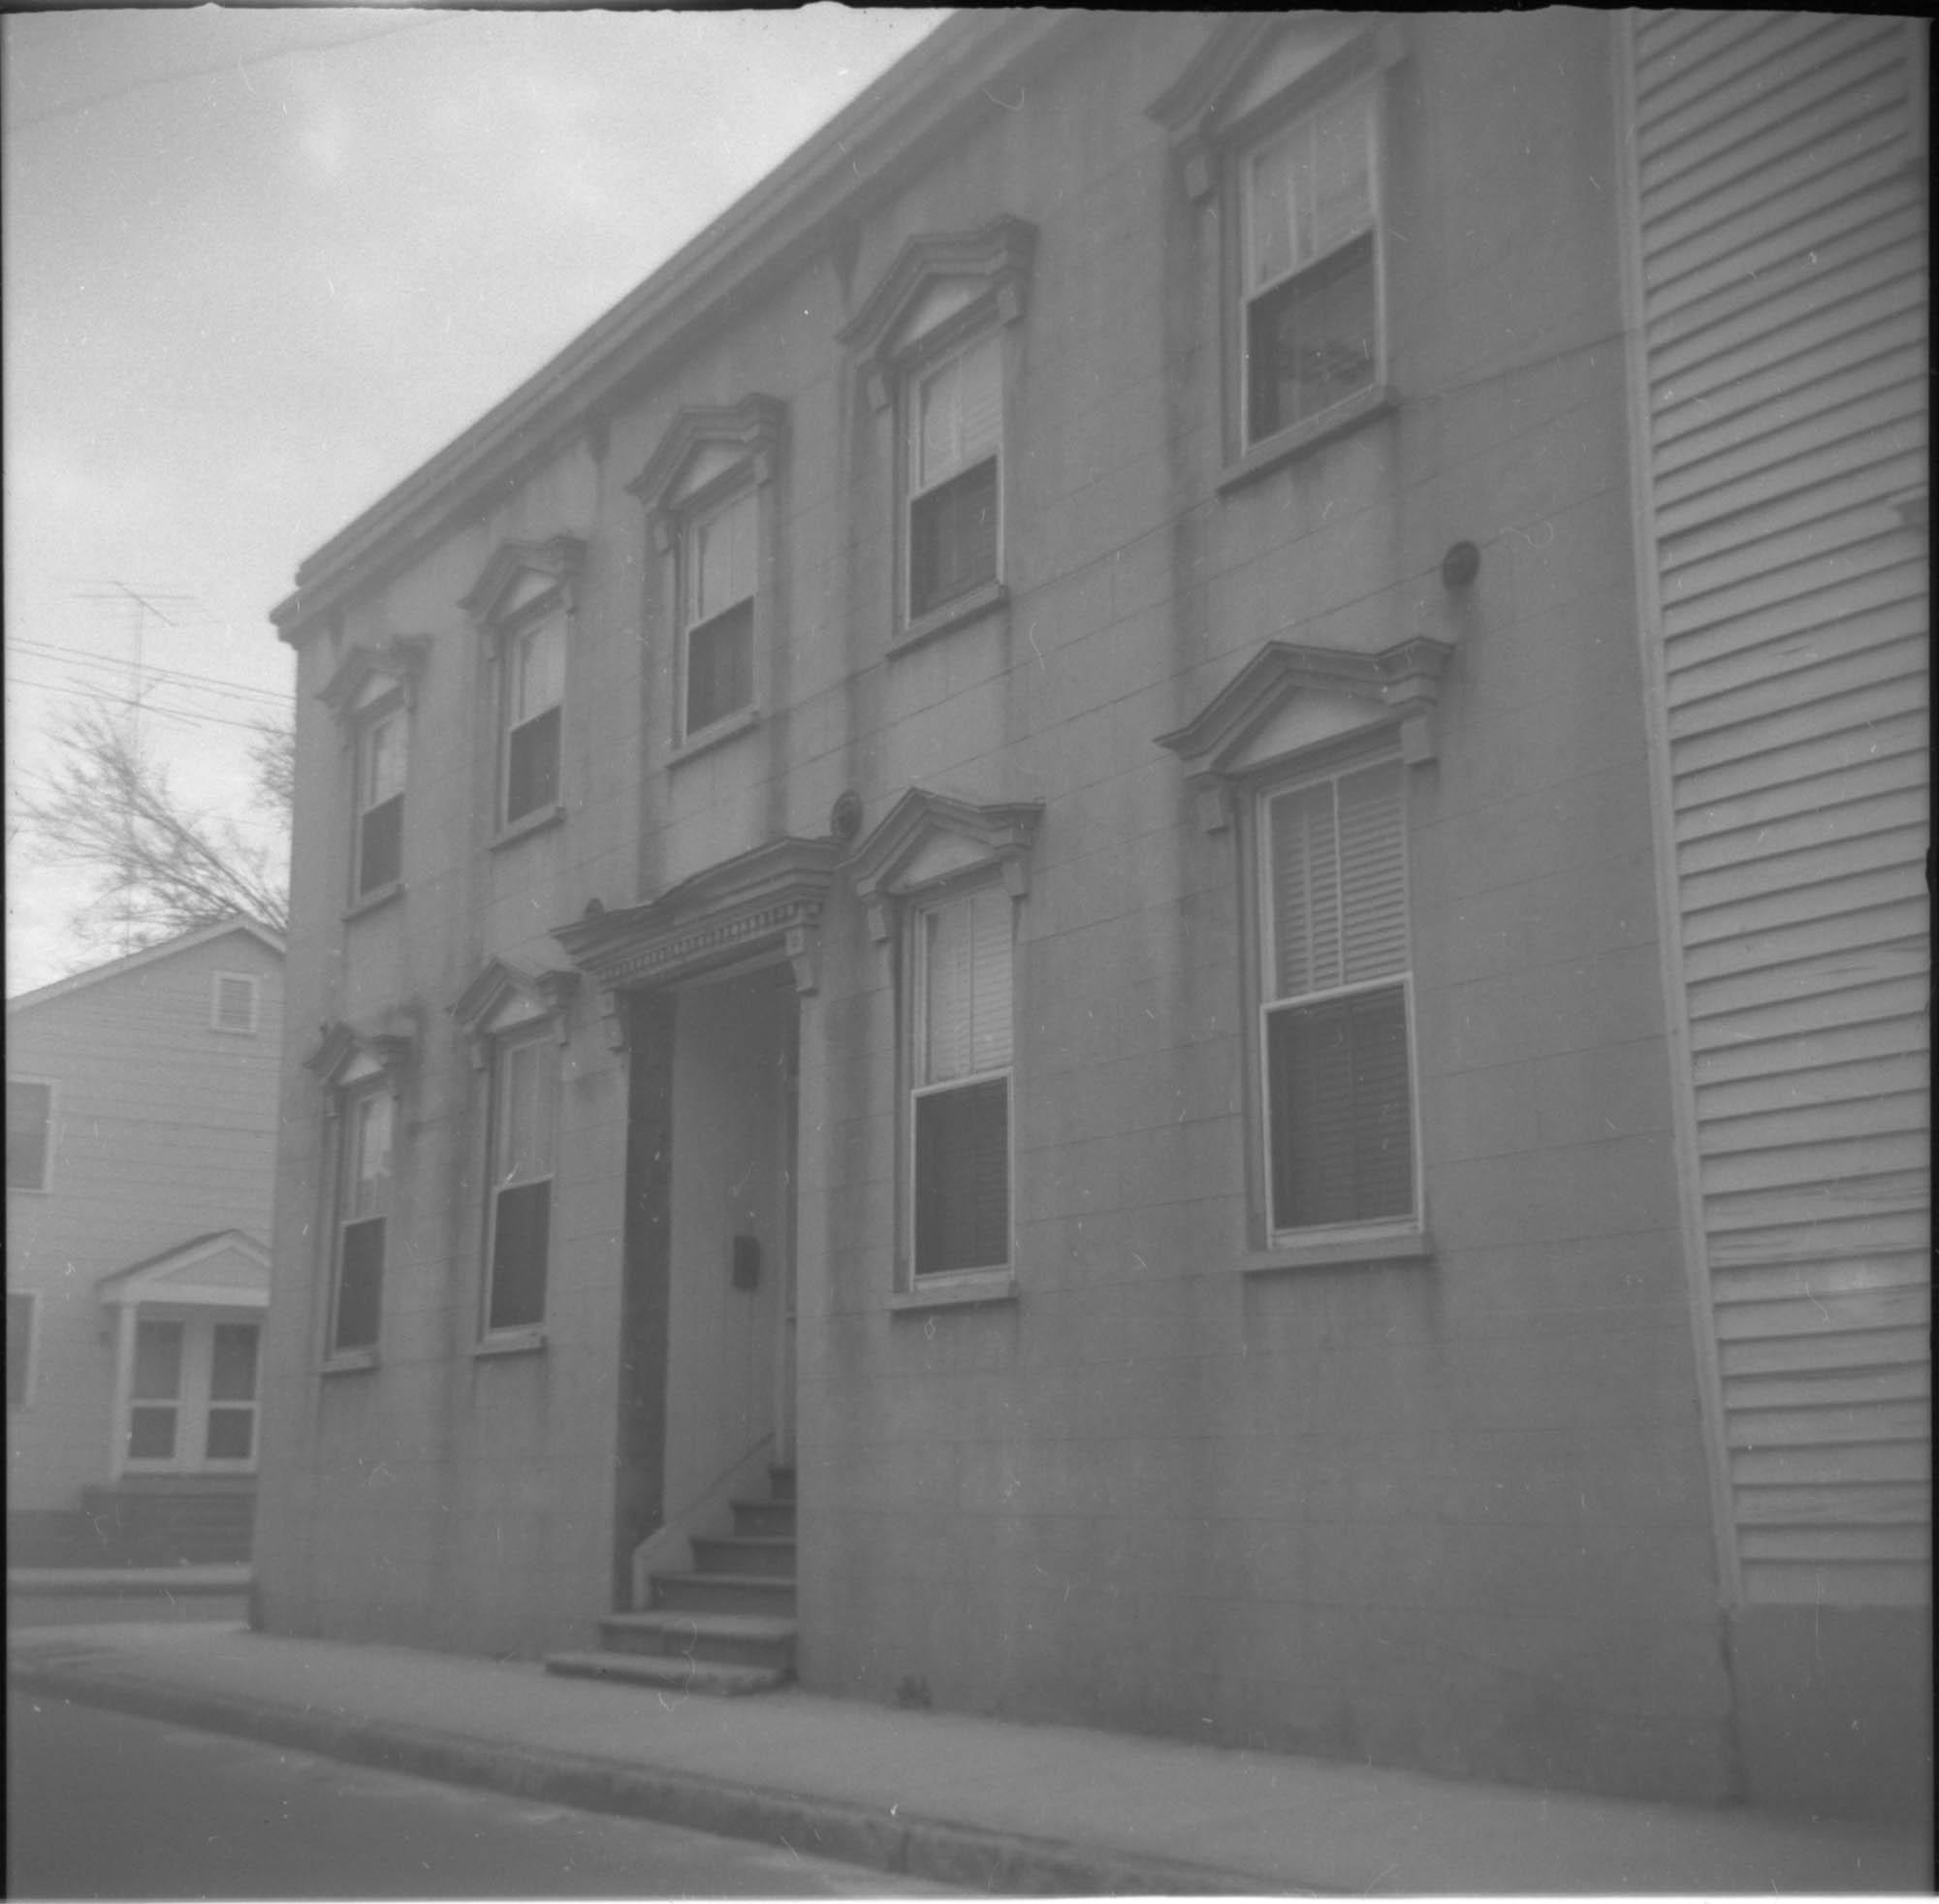 53 Anson Street